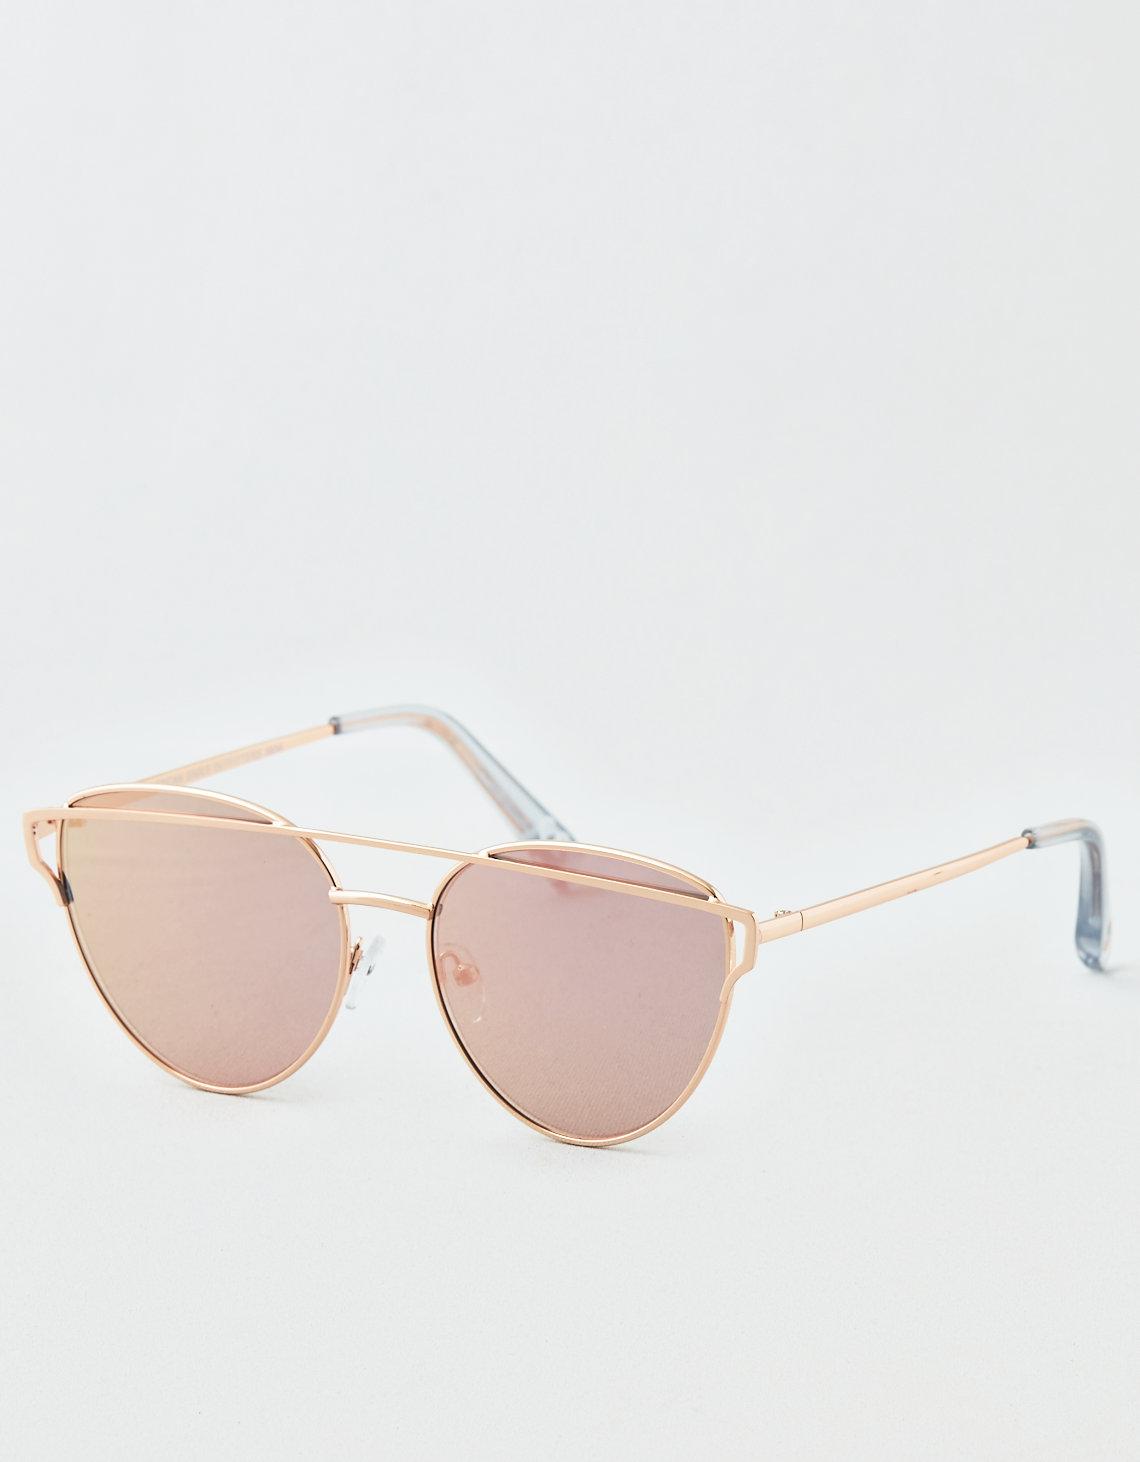 Pink Acrylic Heart Sunglasses Pretty Little Thing V2B5q